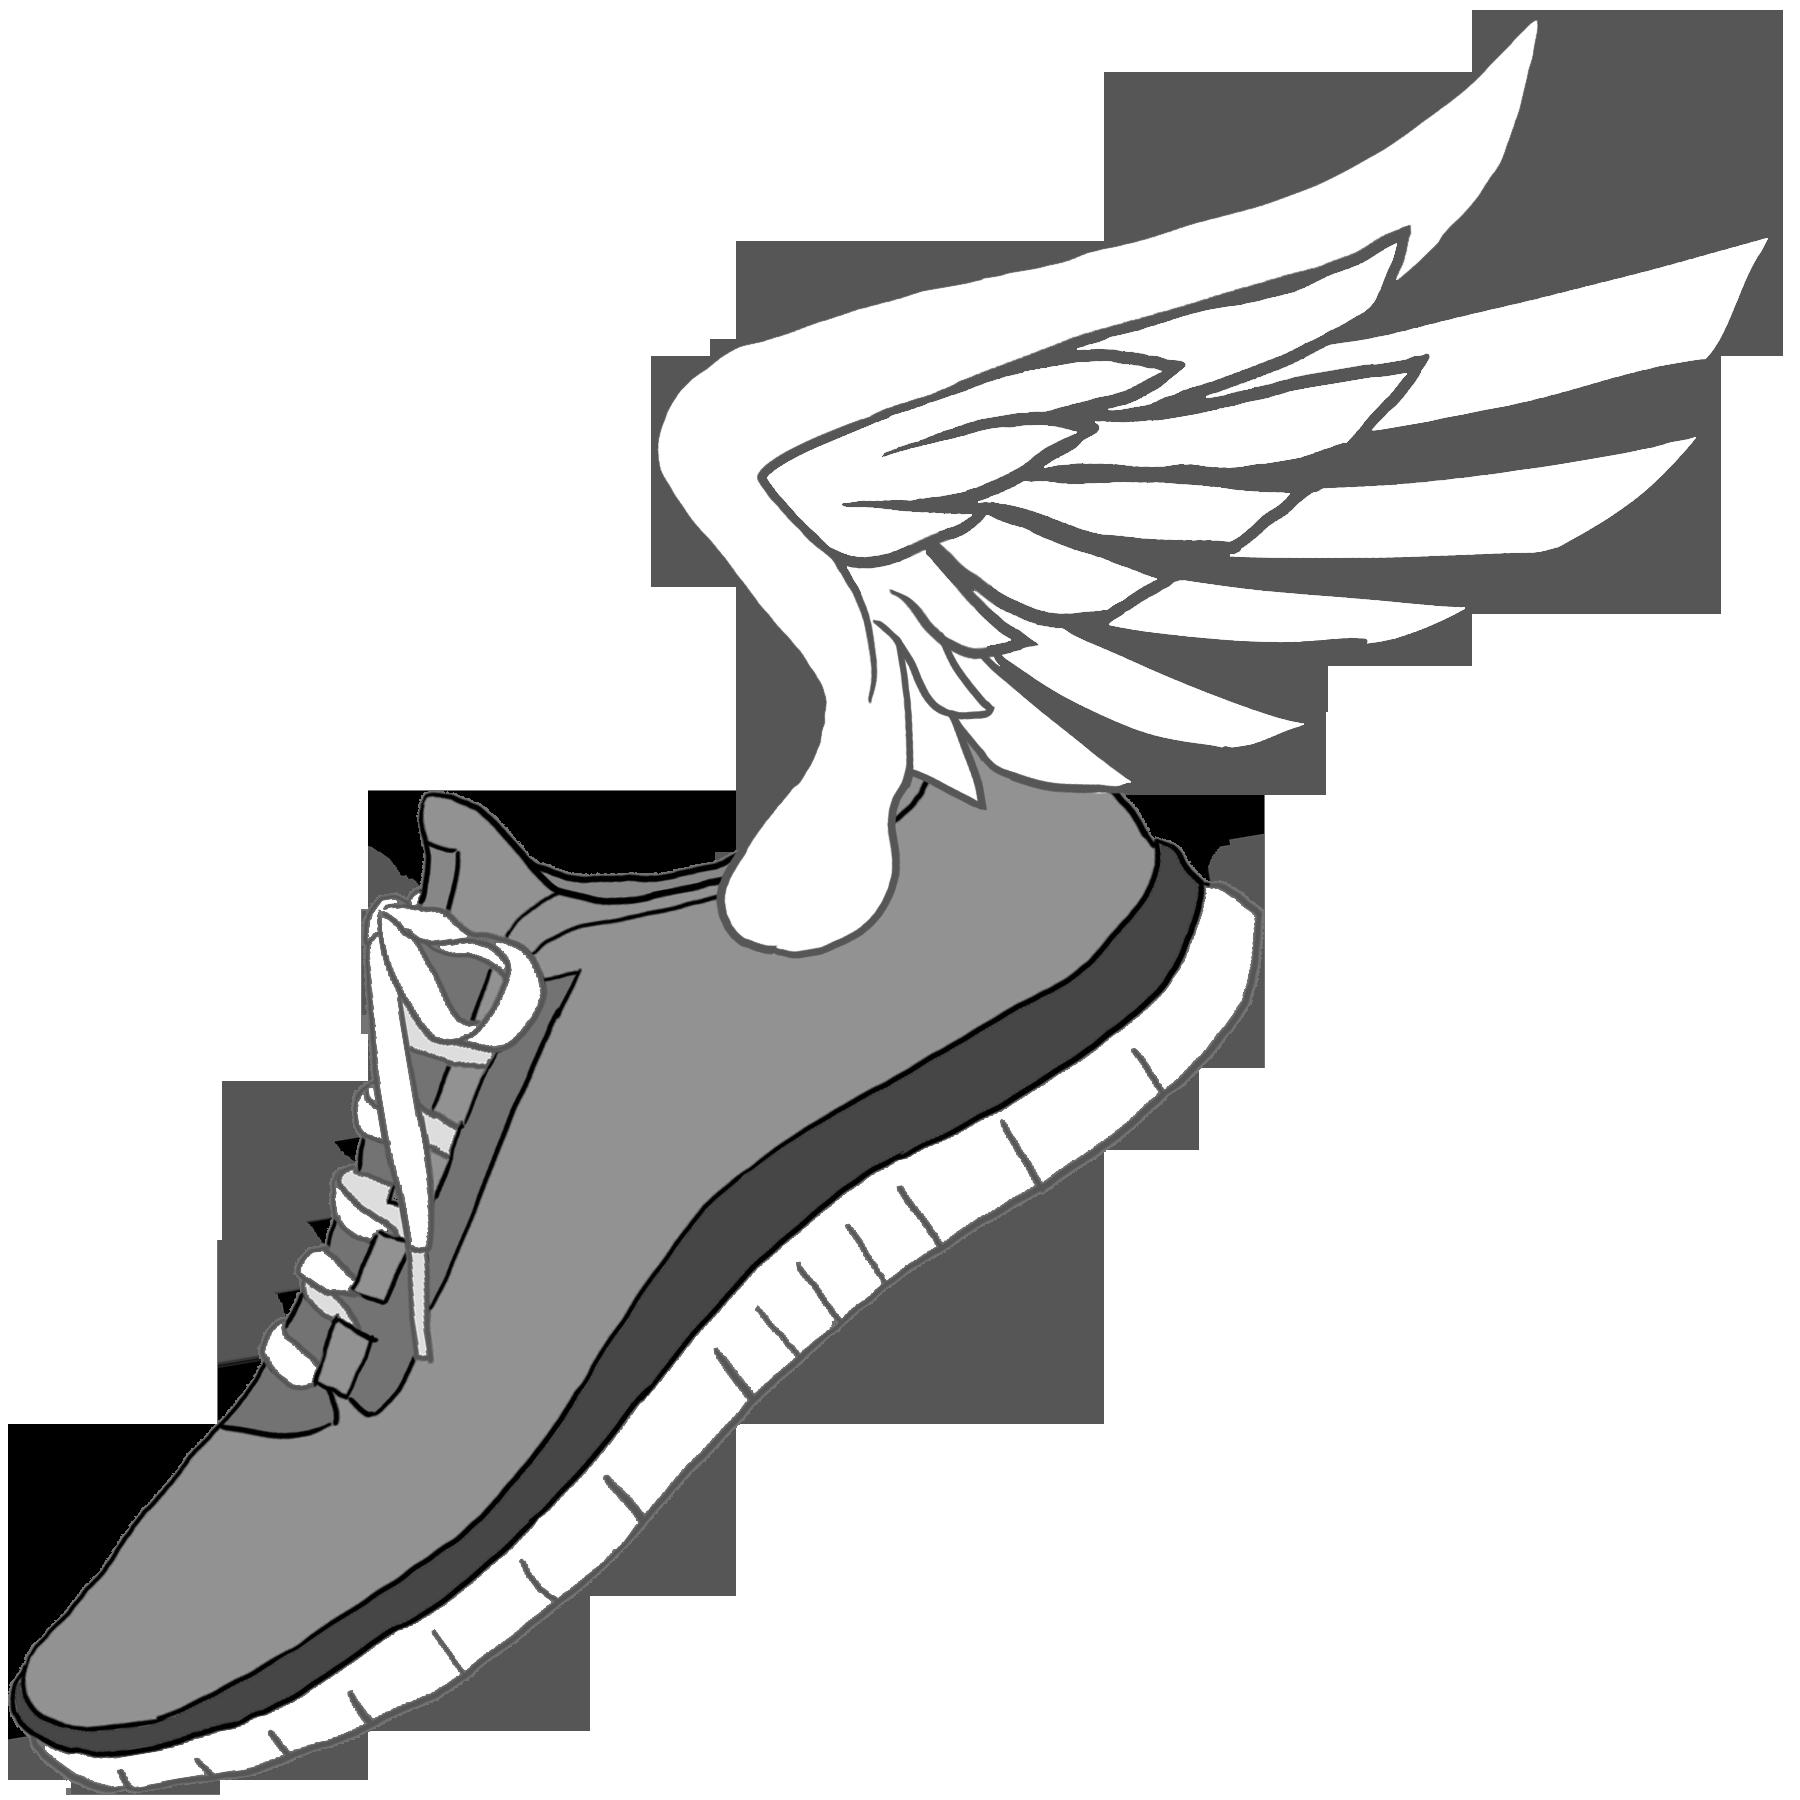 1800x1800 Running Shoes For Women Cartoon Group